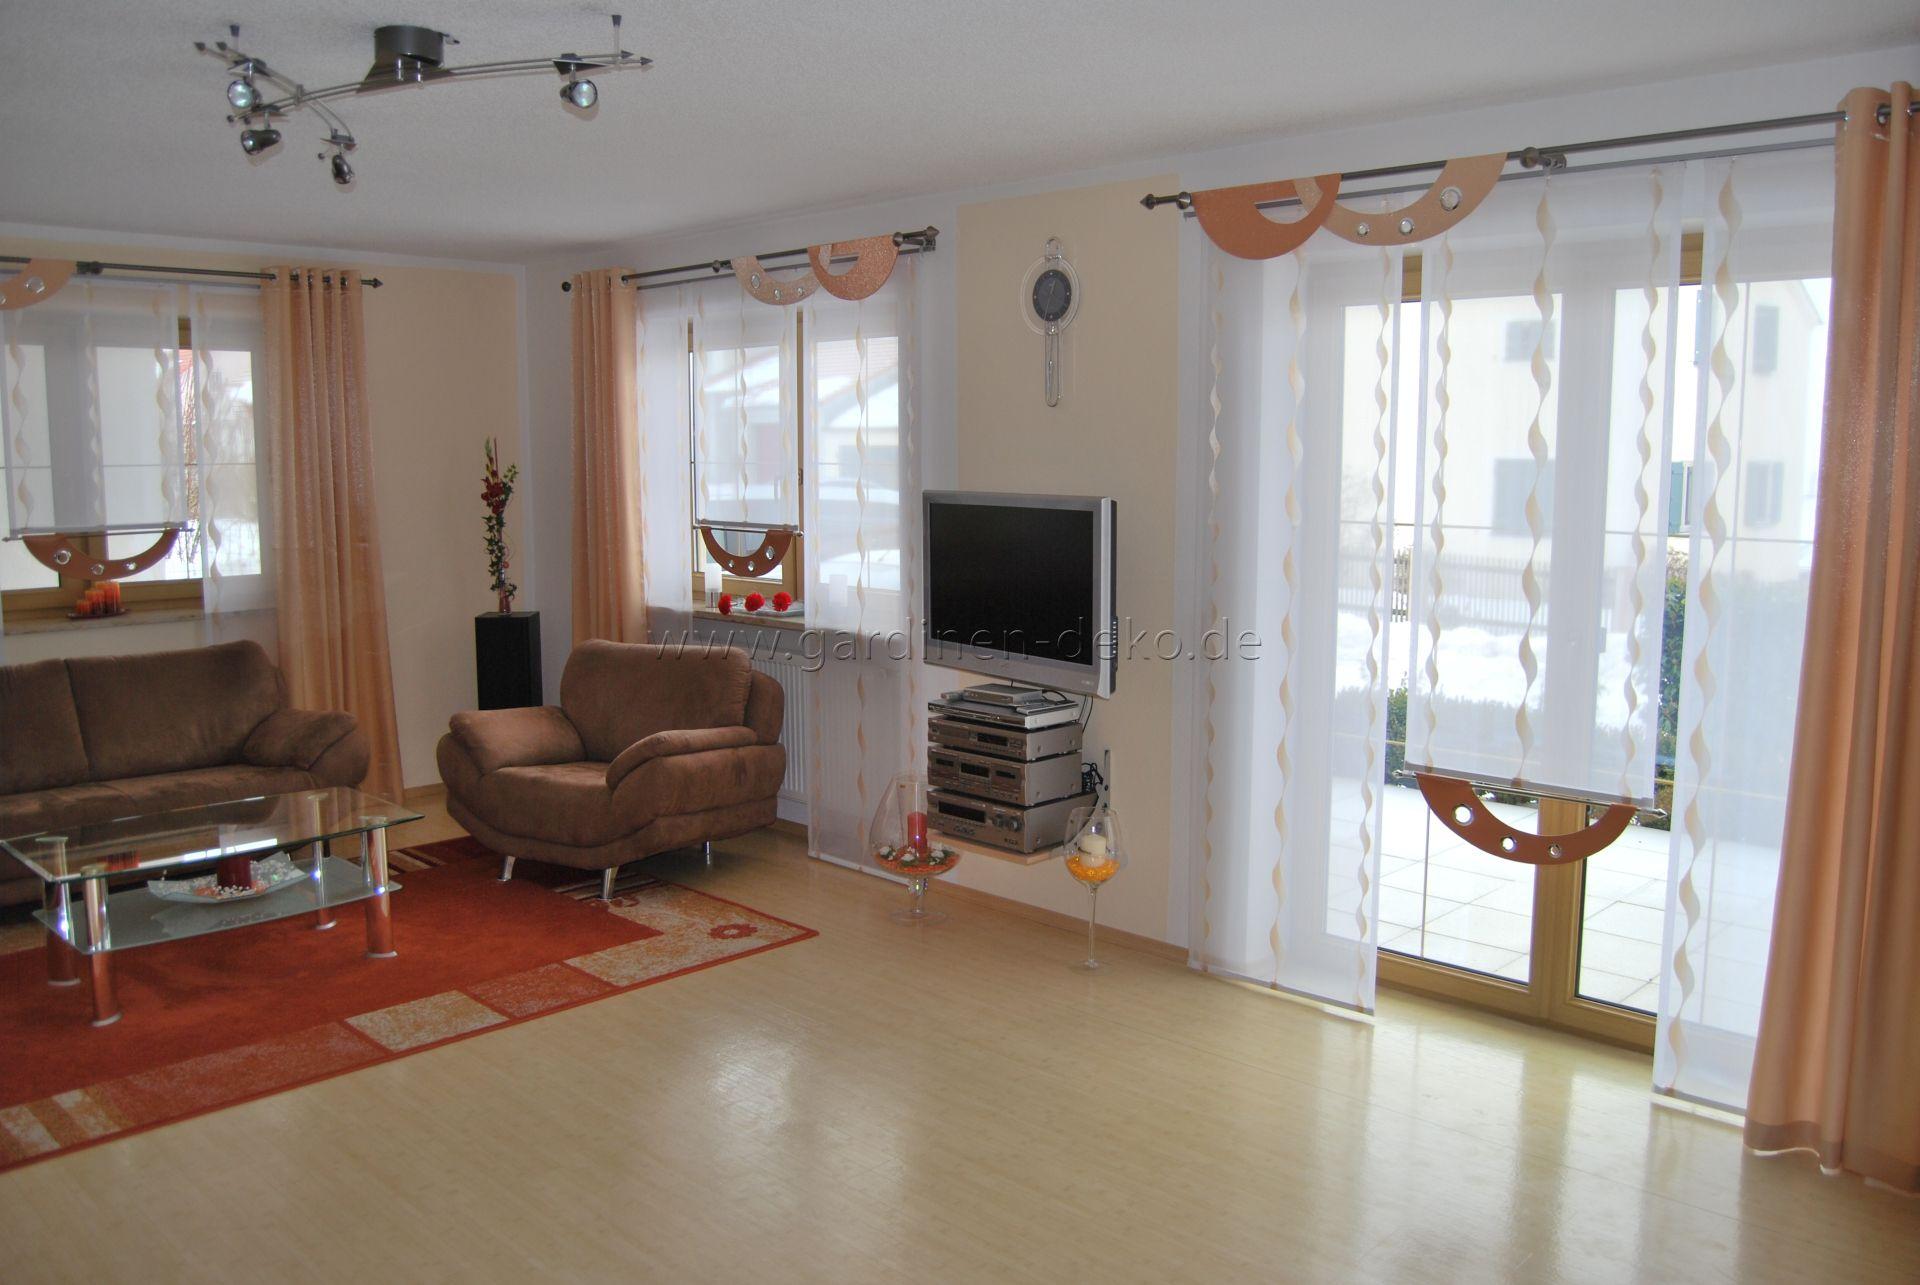 Schone Gardinen Furs Wohnzimmer Room Home Living Room